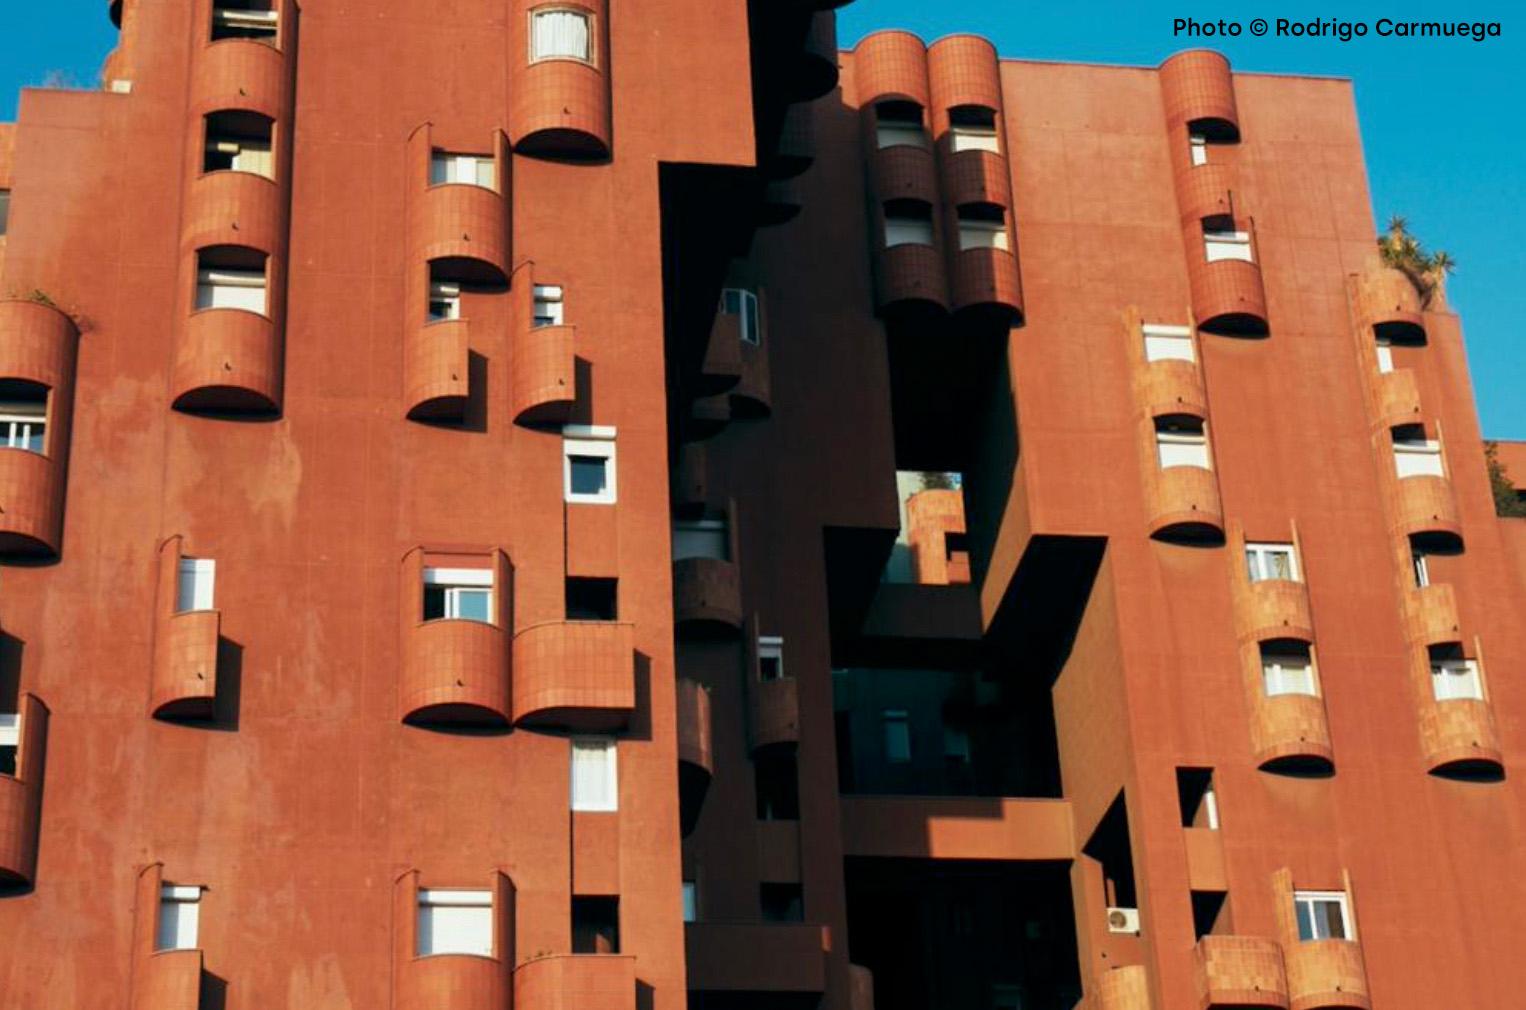 Architecture & Travel